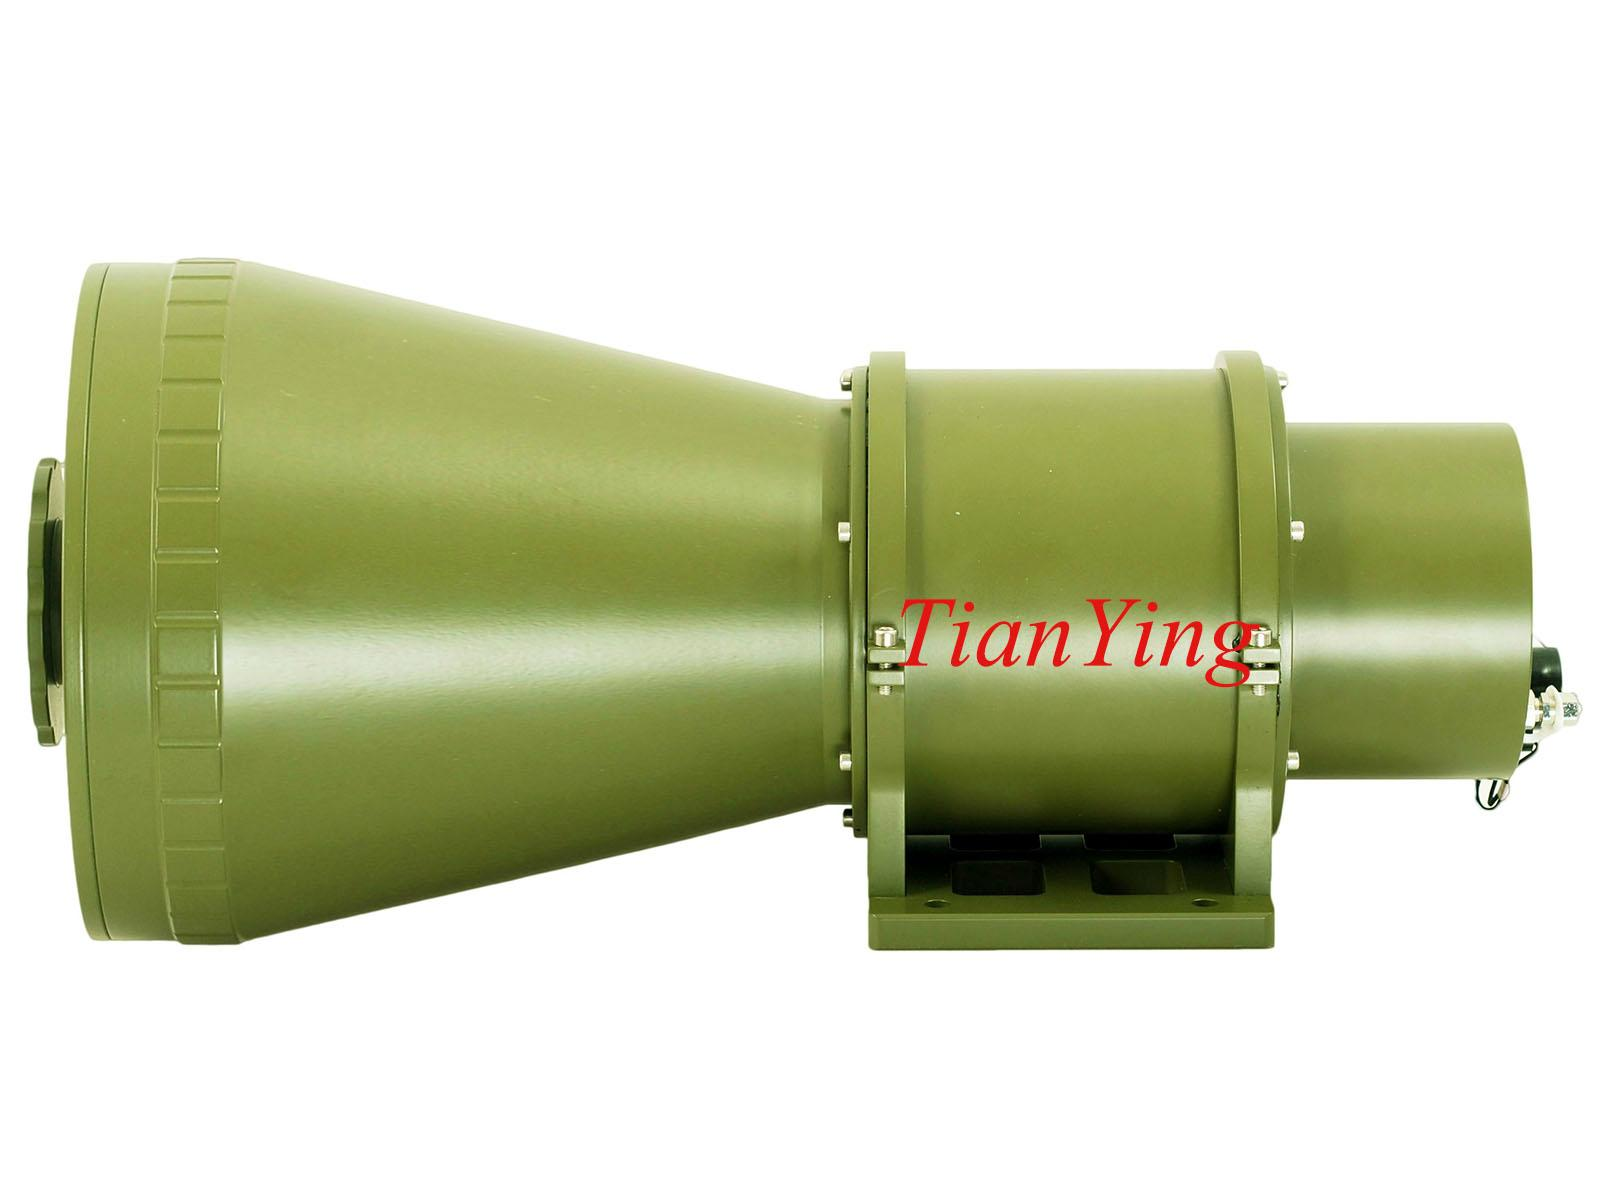 D200 640x512 50/200mm Focus 4.5km/7km Uncooled Thermal Imaging Camera